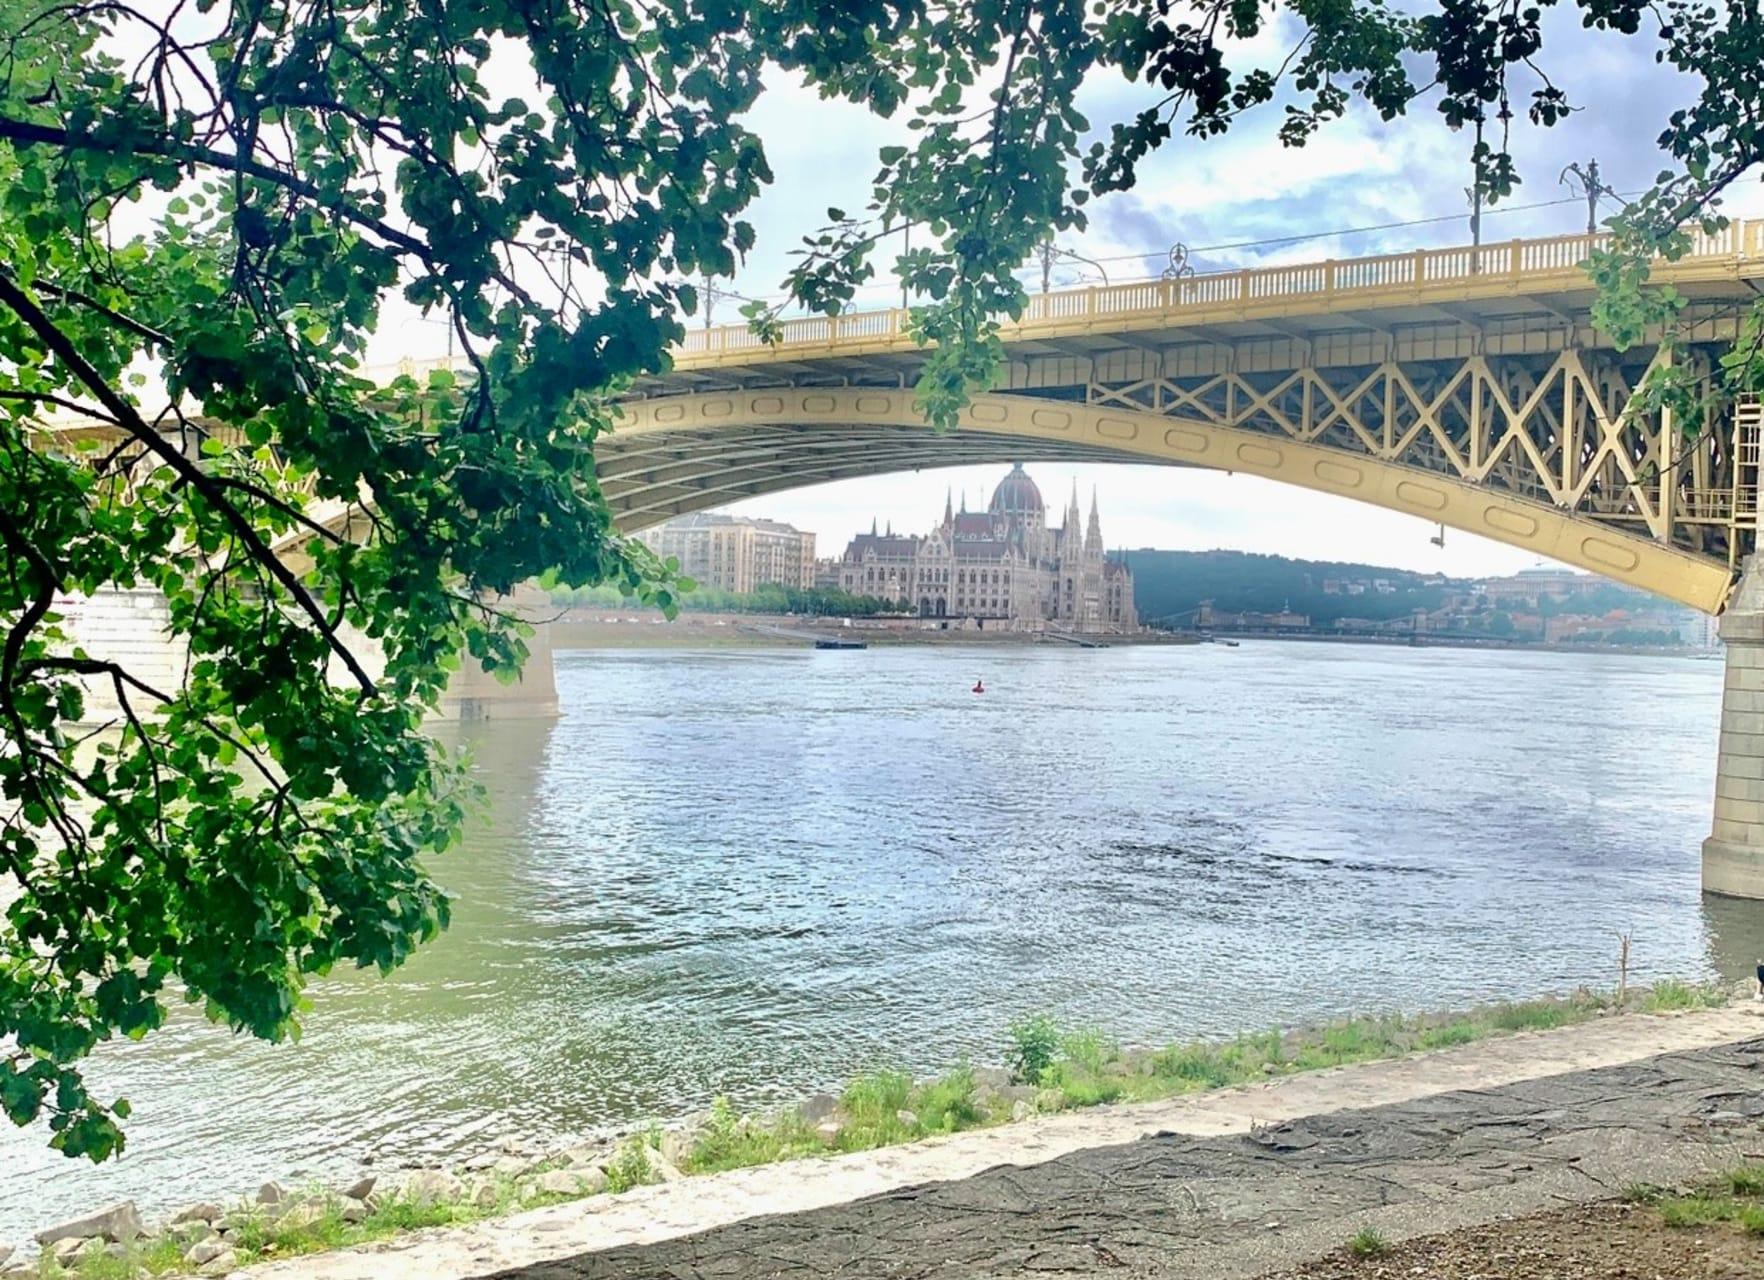 Budapest - Margaret Island Budapest - Exploring the South part and the Margaret Bridge - Part 3